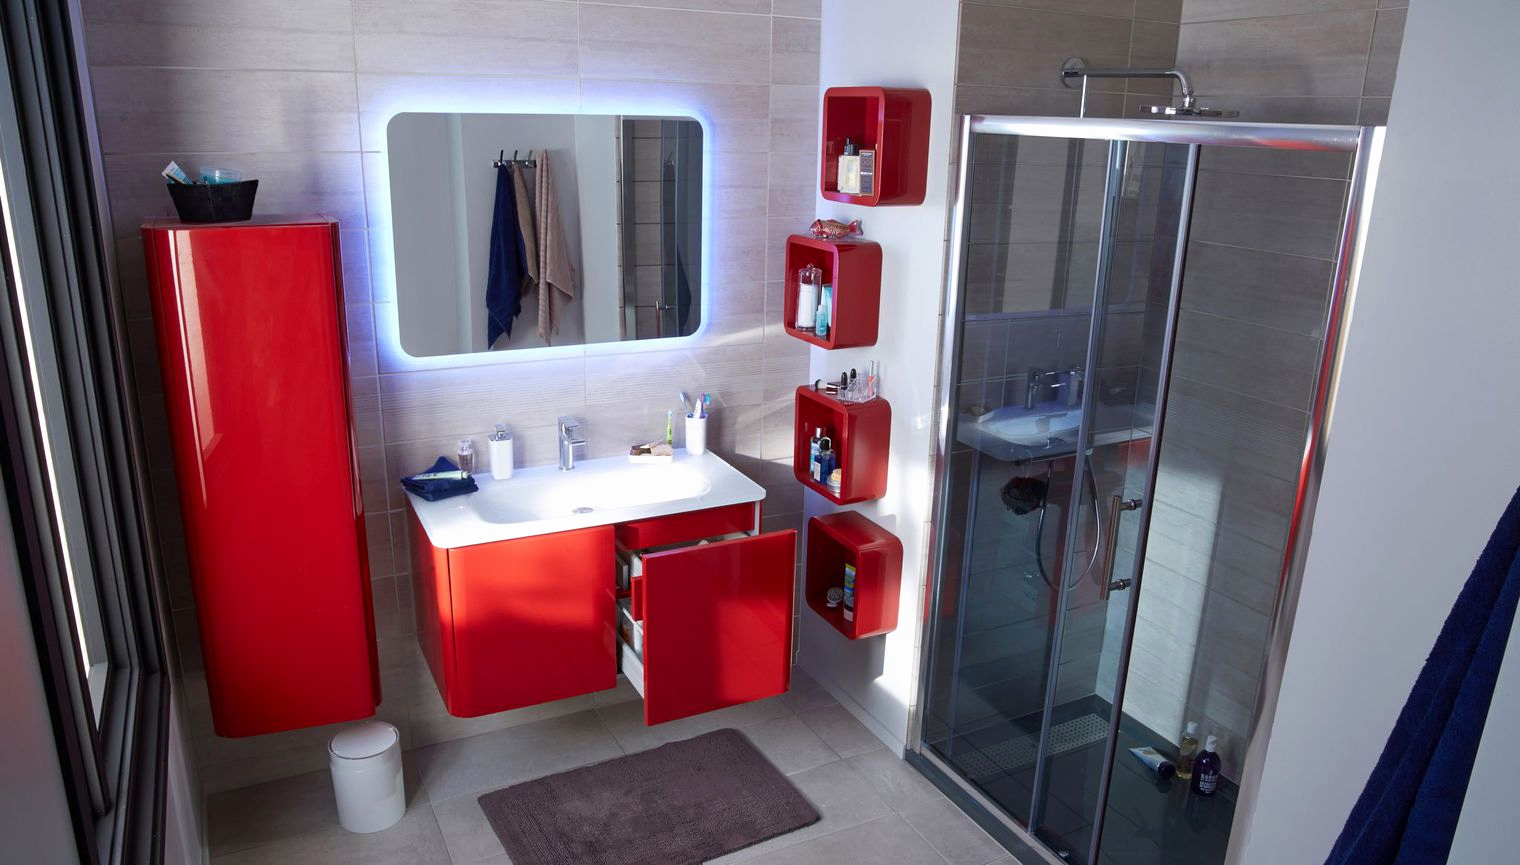 Castorama peinture cuisine salle de bain - Idées de travaux